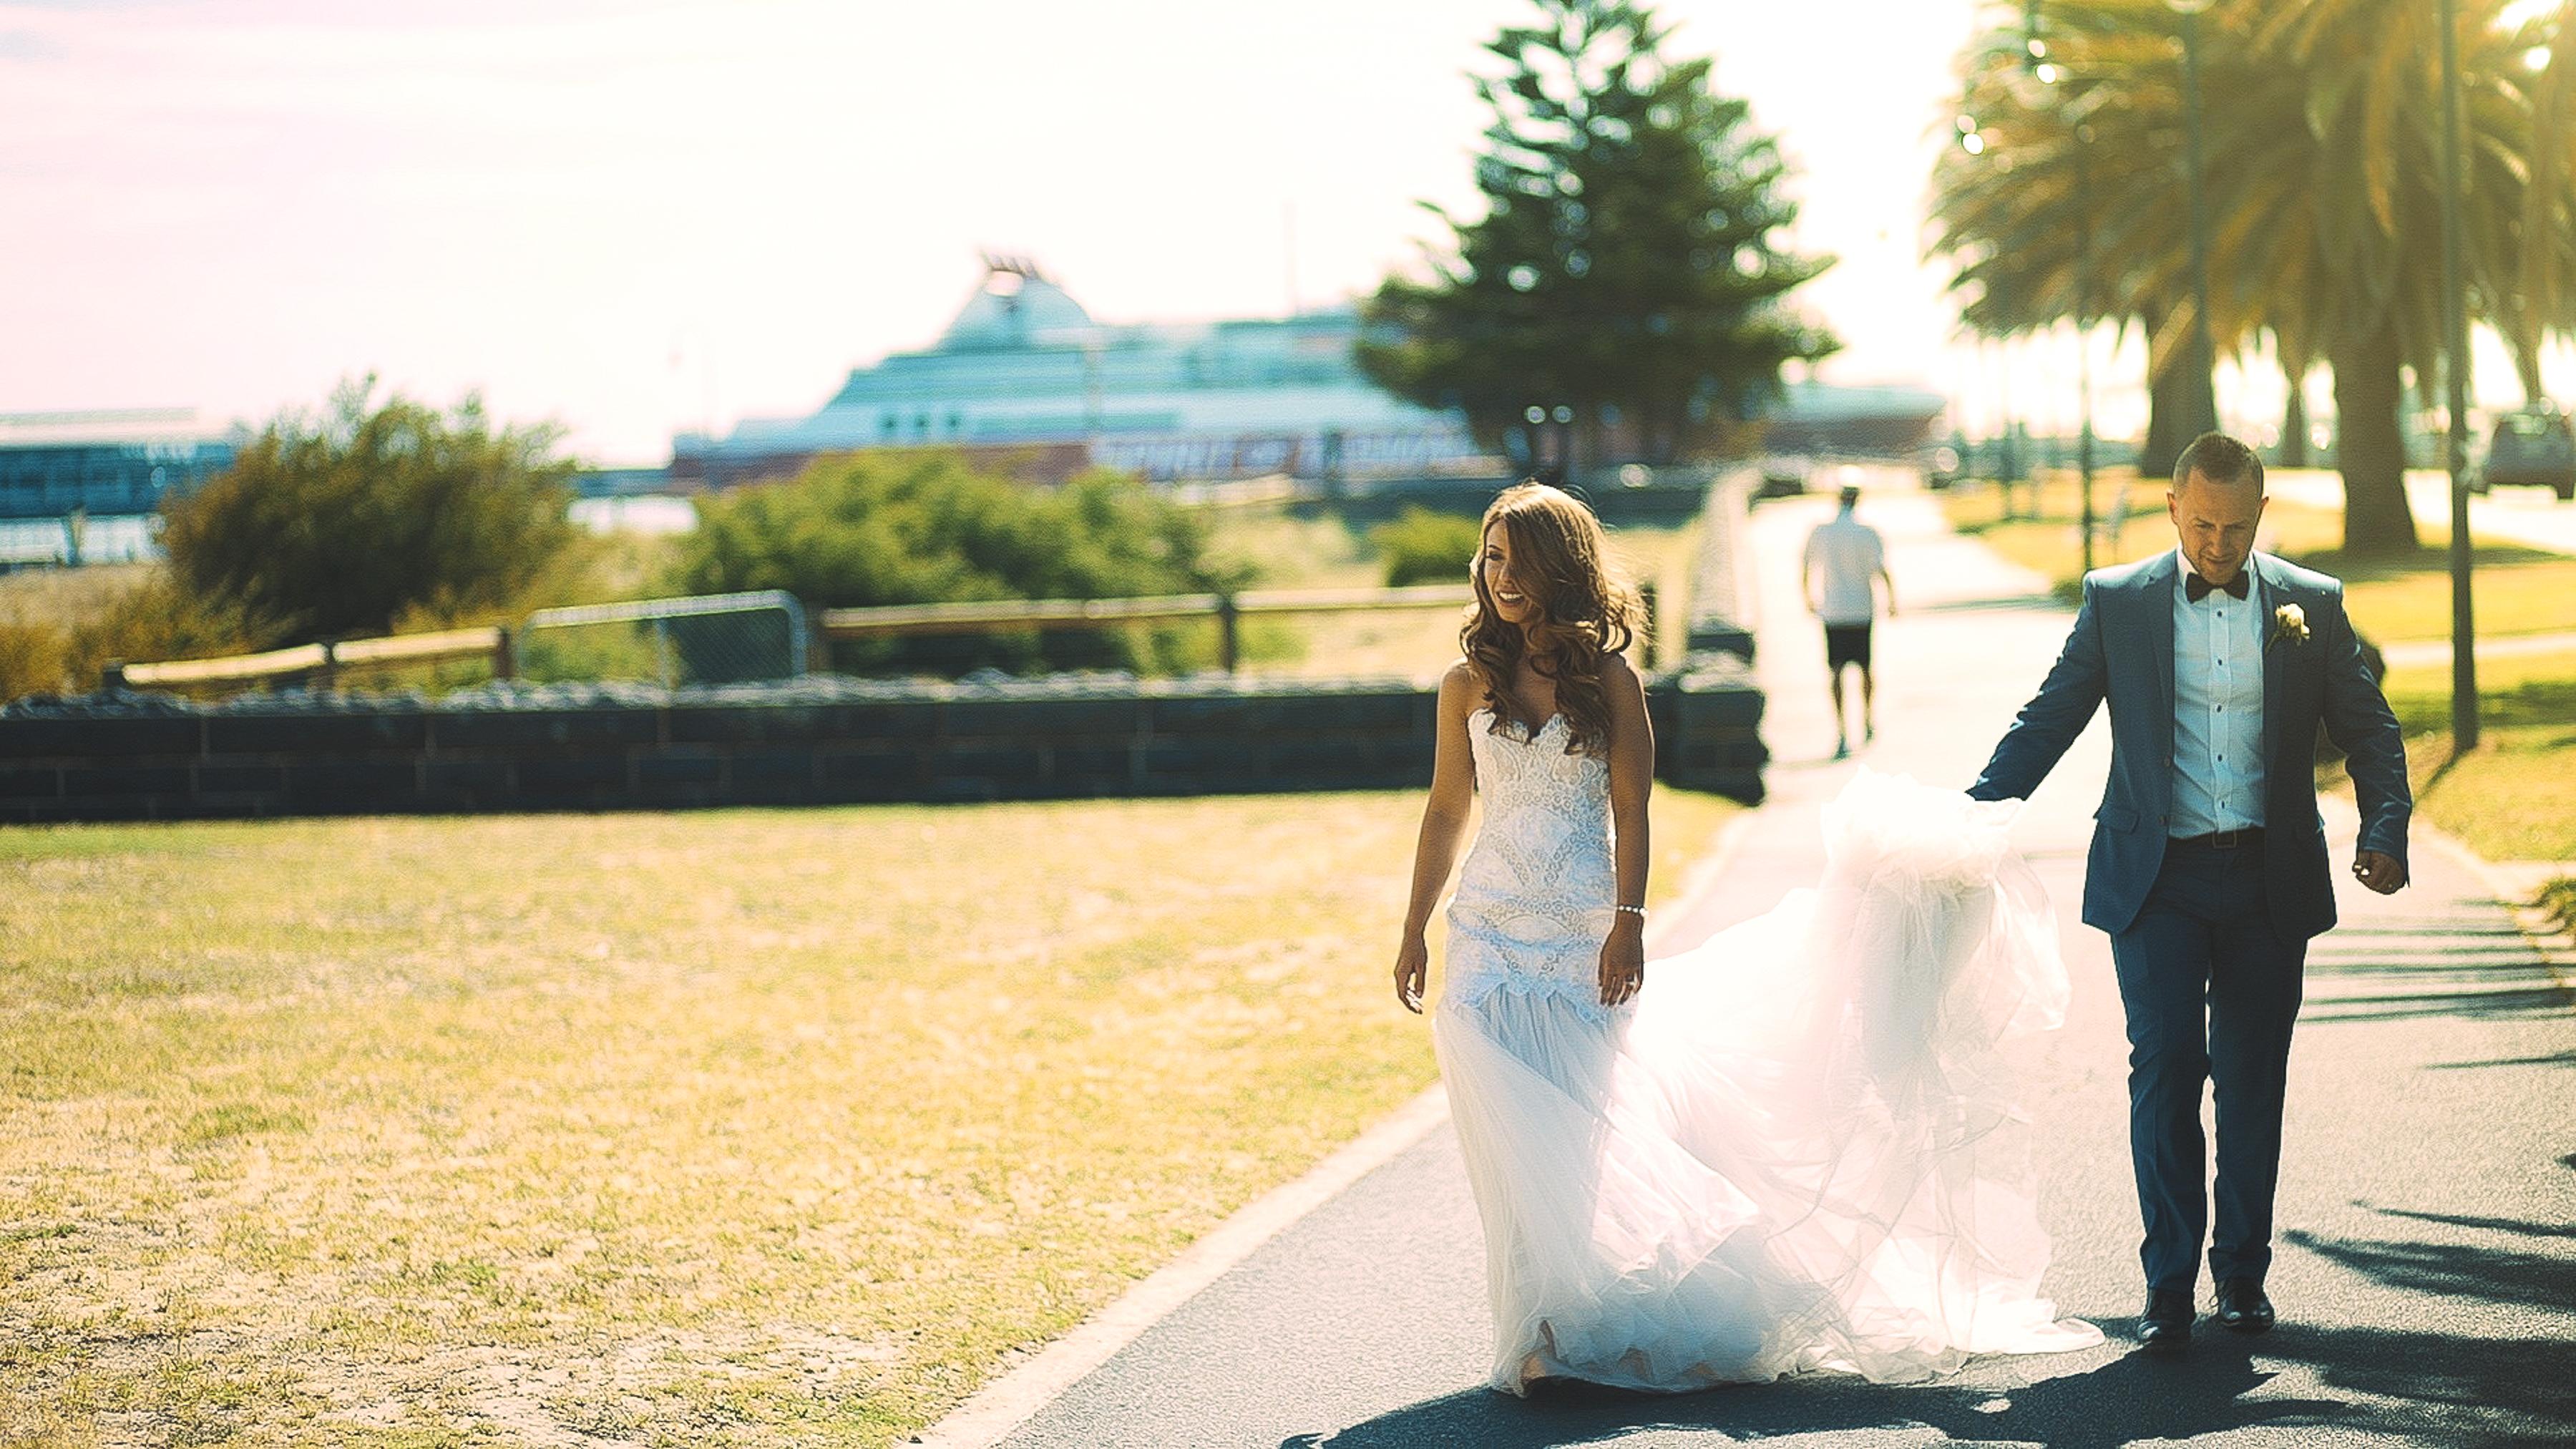 https://sleeklens.com/wp-content/uploads/2018/09/wedding-lightroom-presets-signature-bride-groom-after-11.jpg